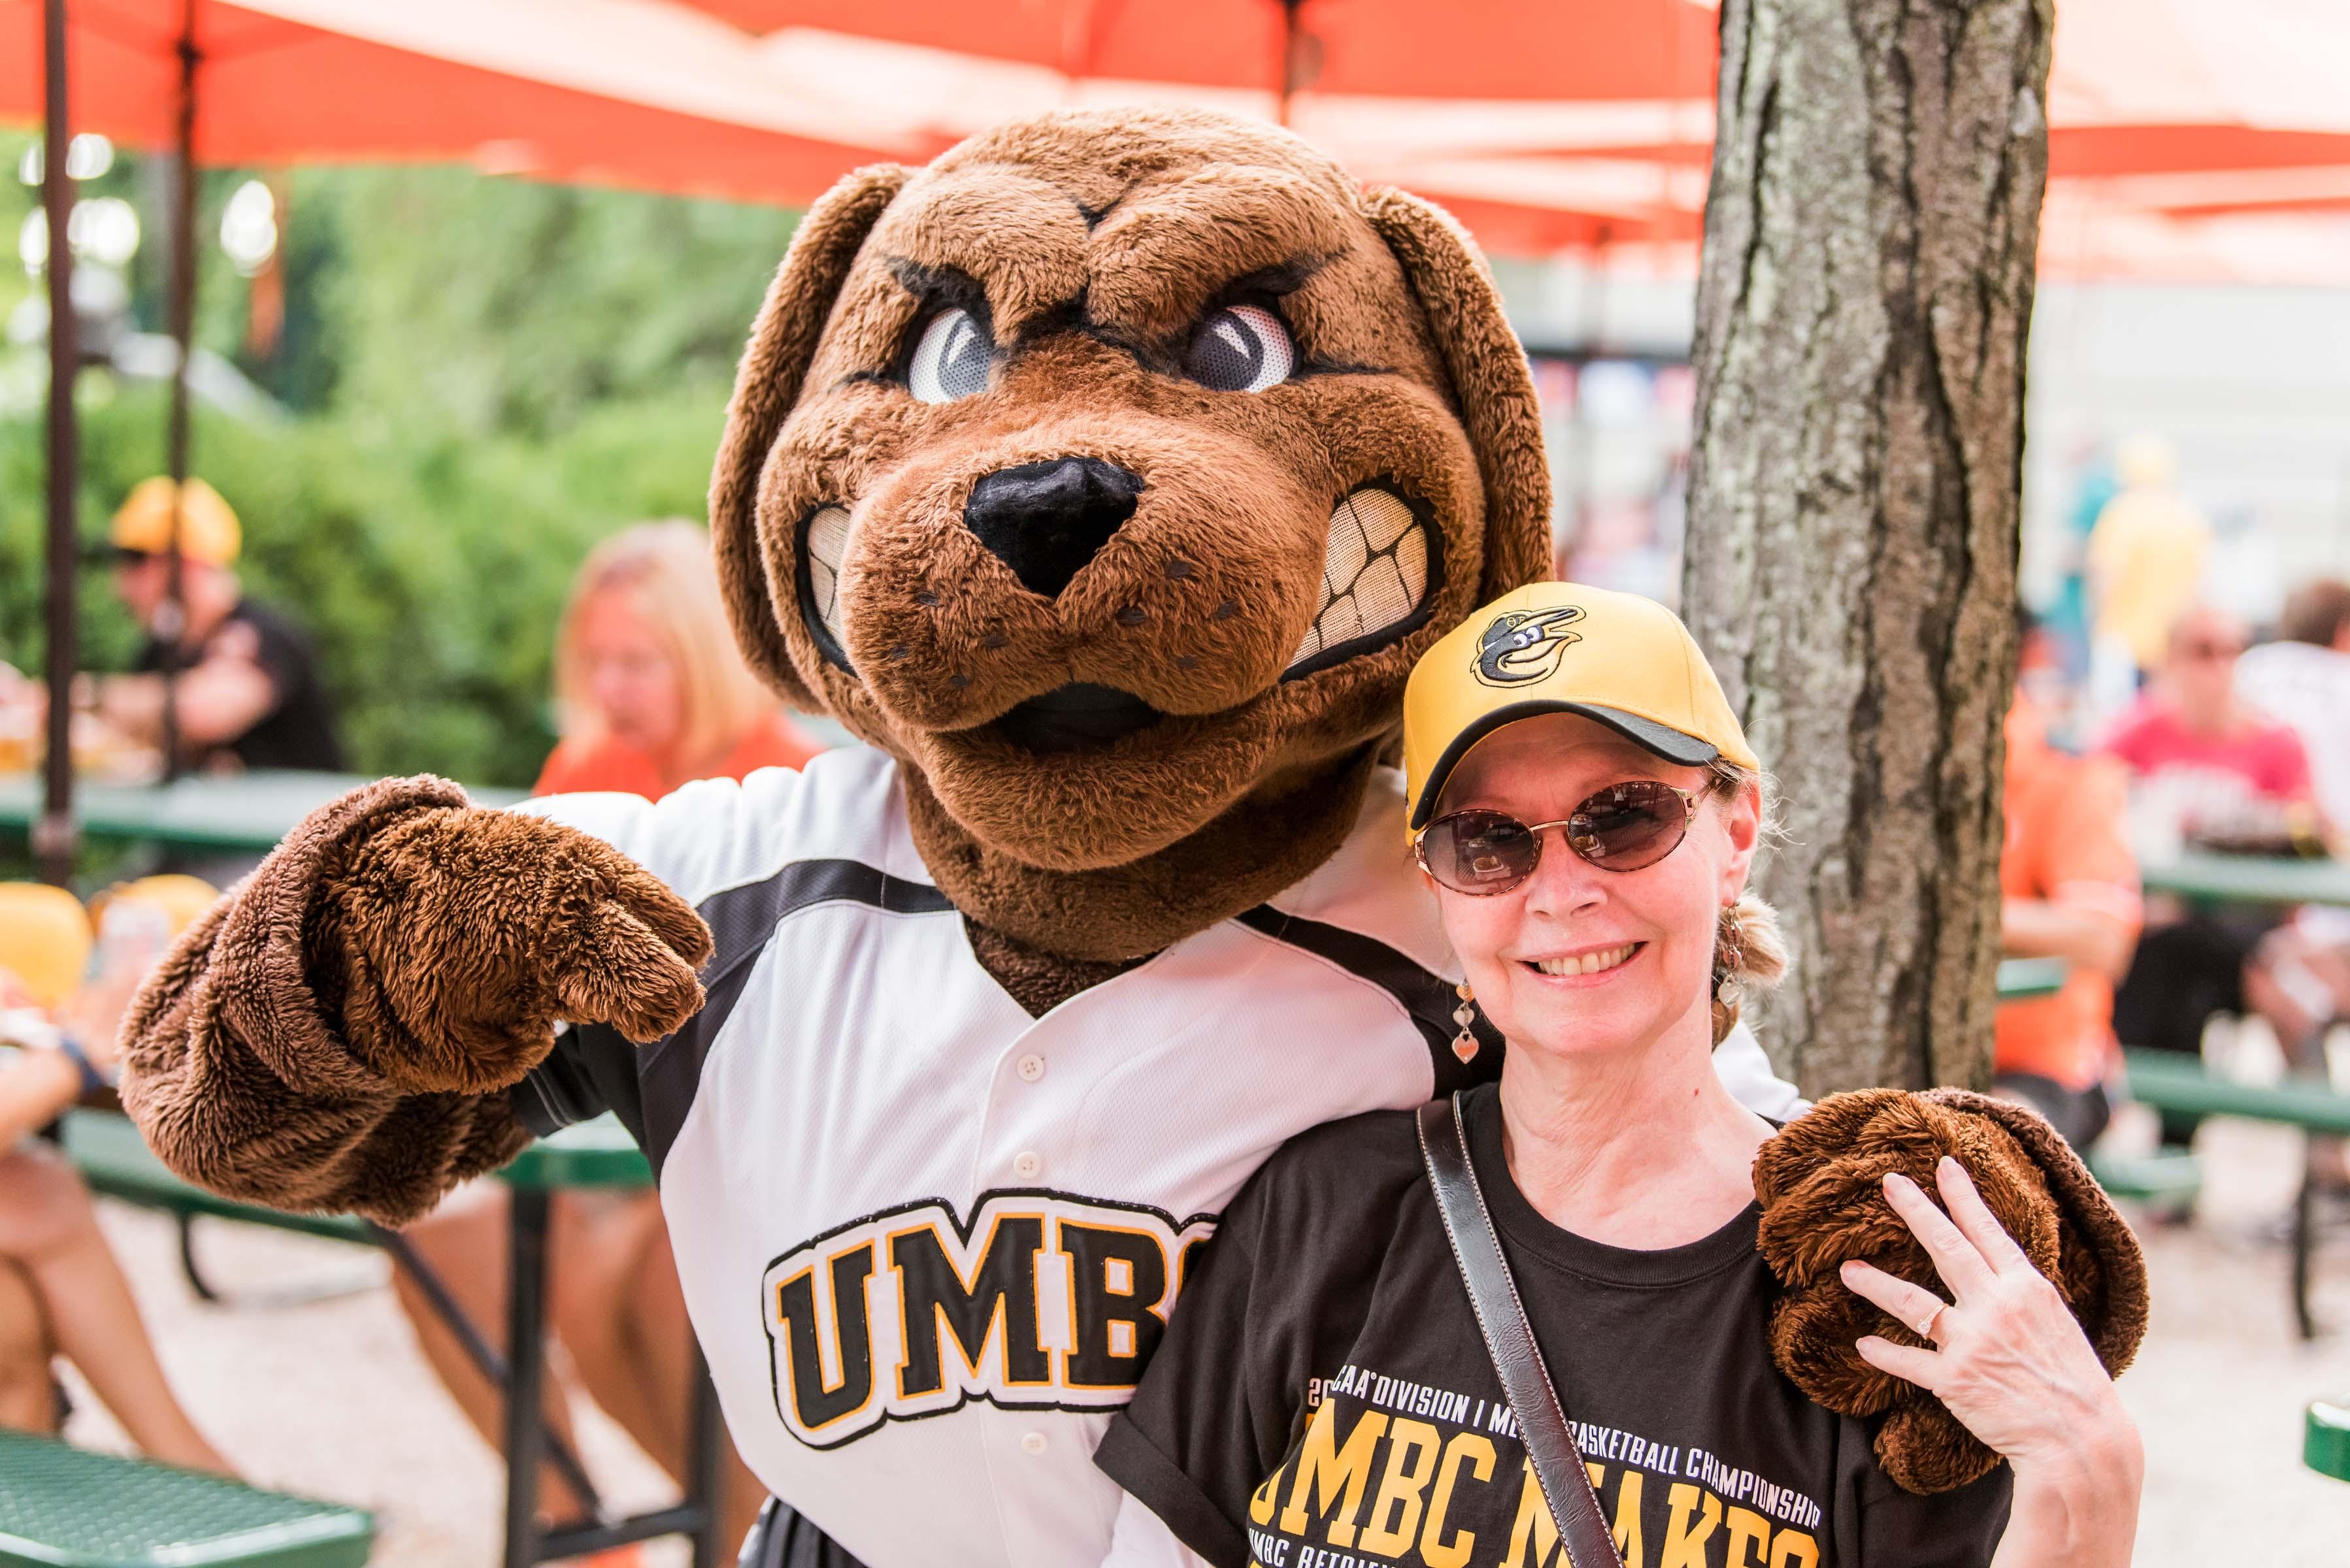 UMBC mascot posing with fan